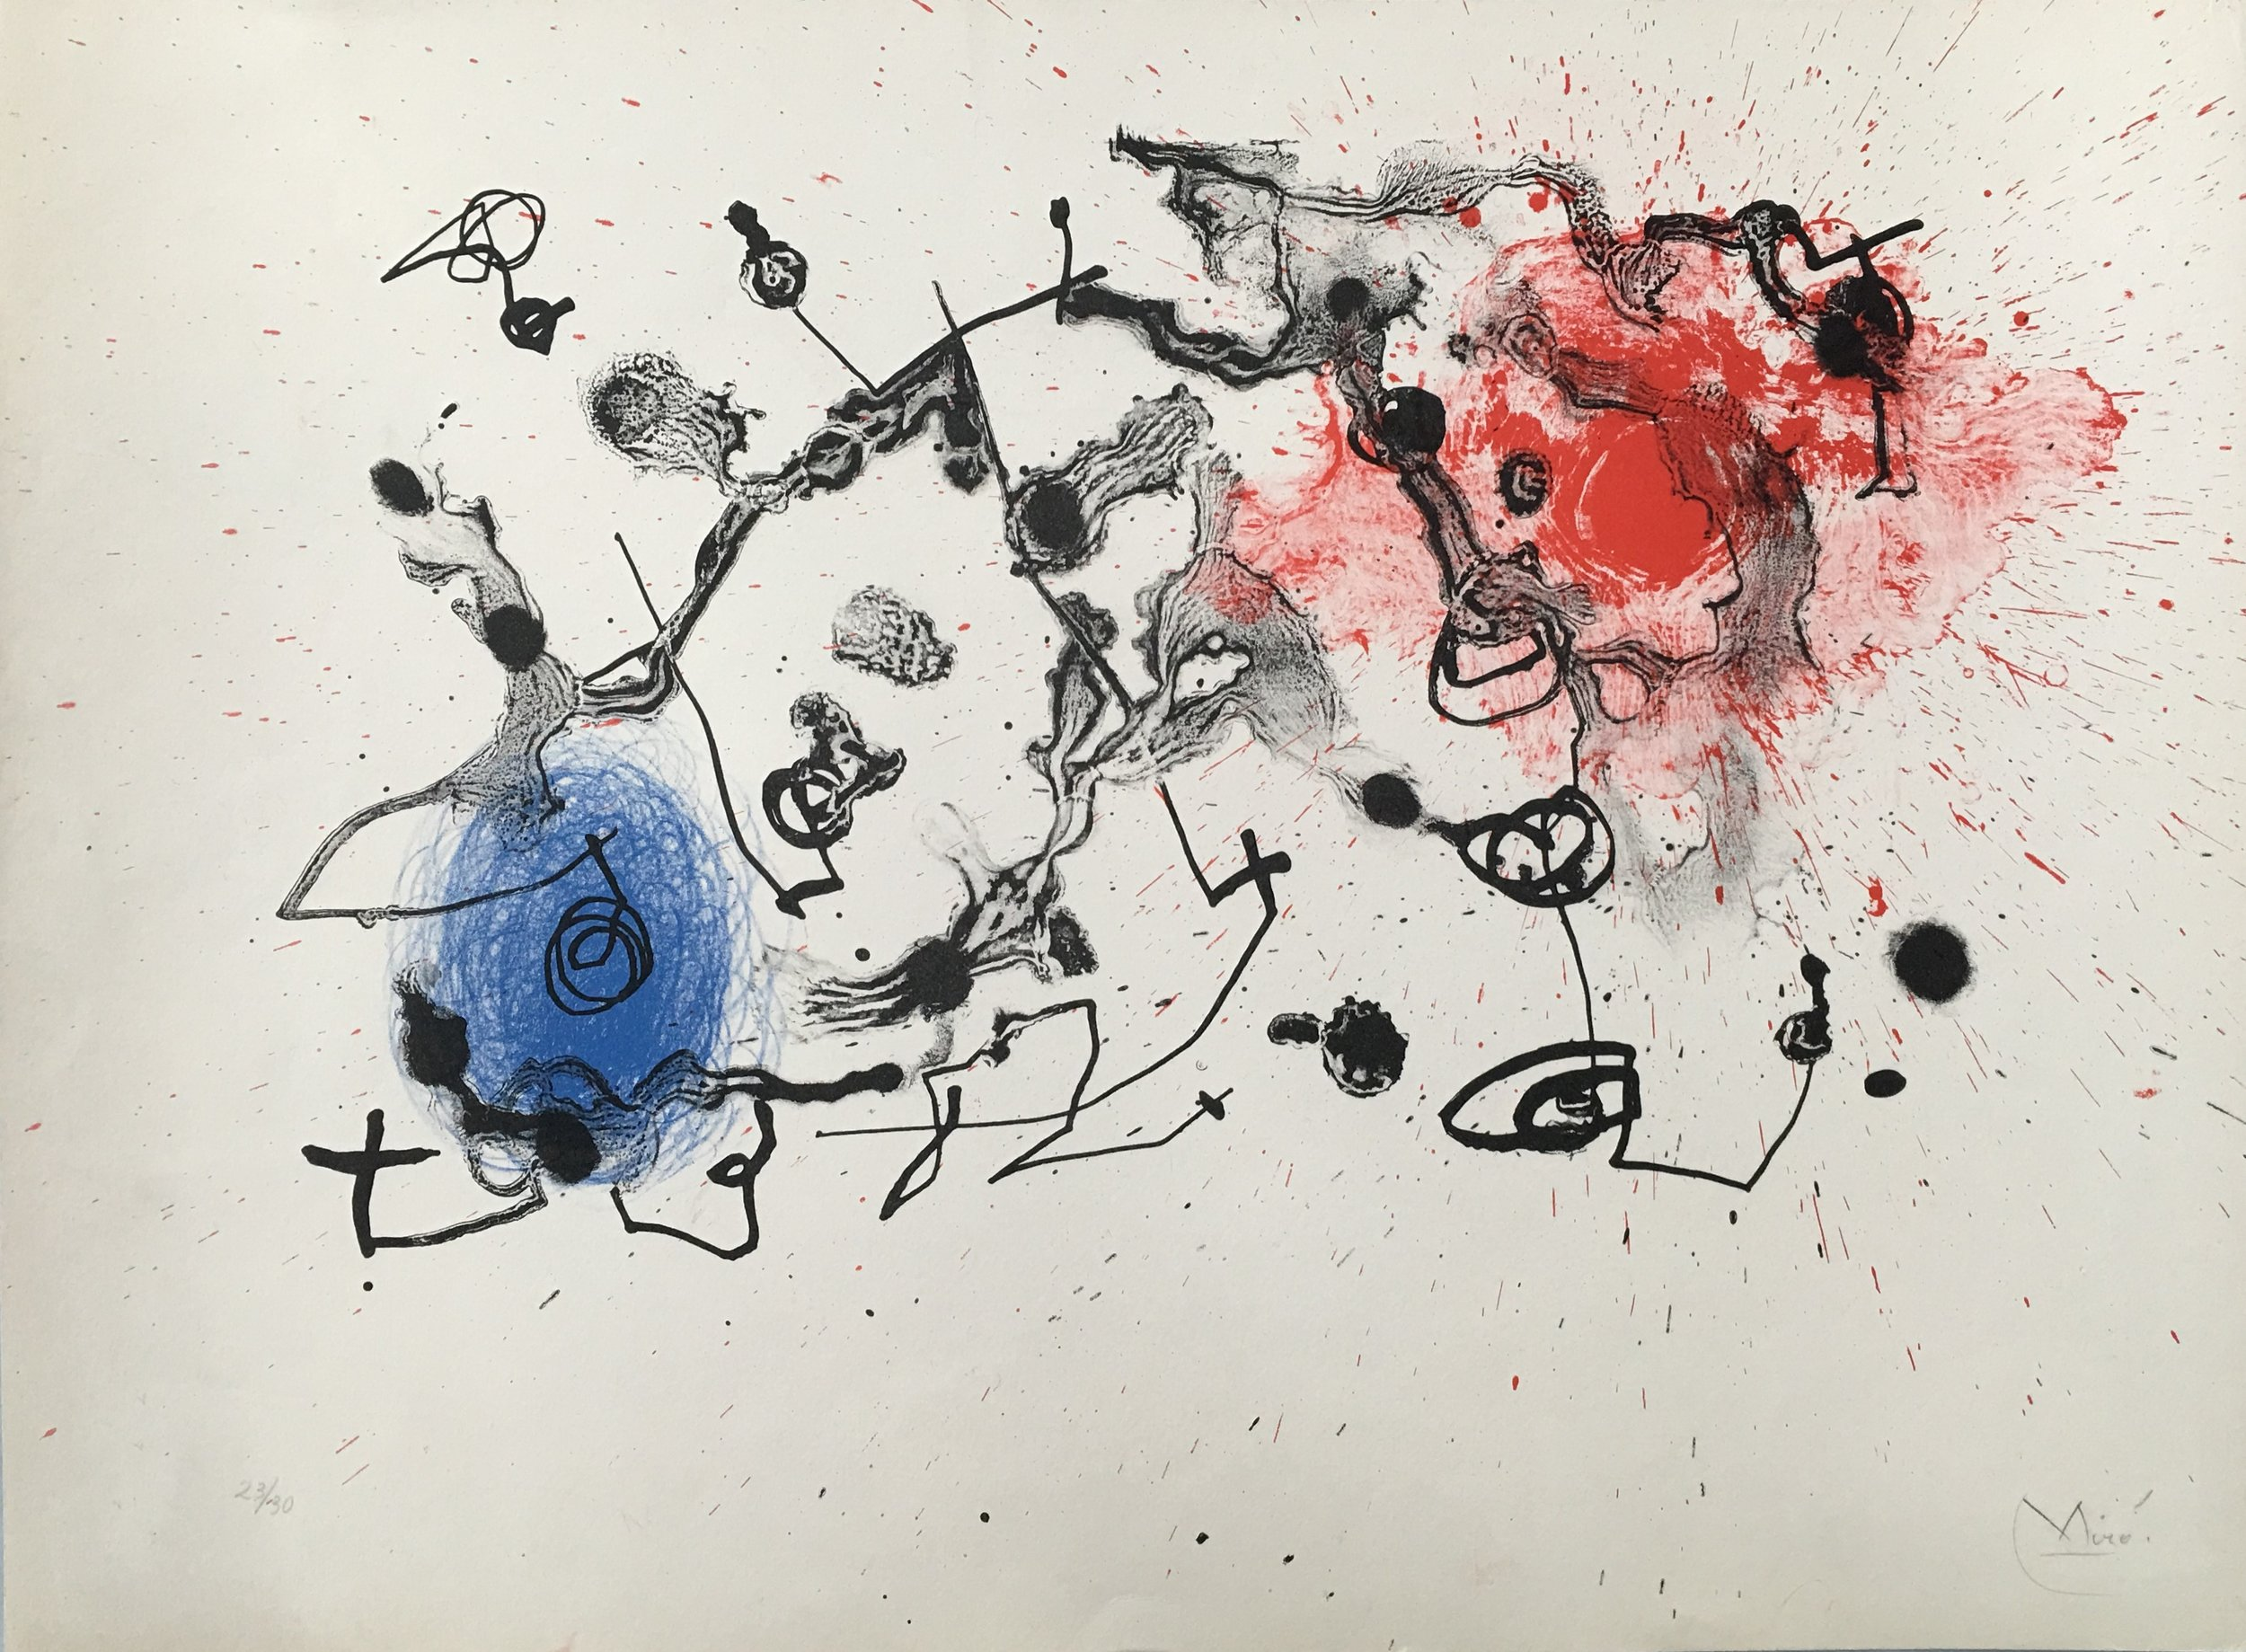 Joan Miró - Series II Blue and Red